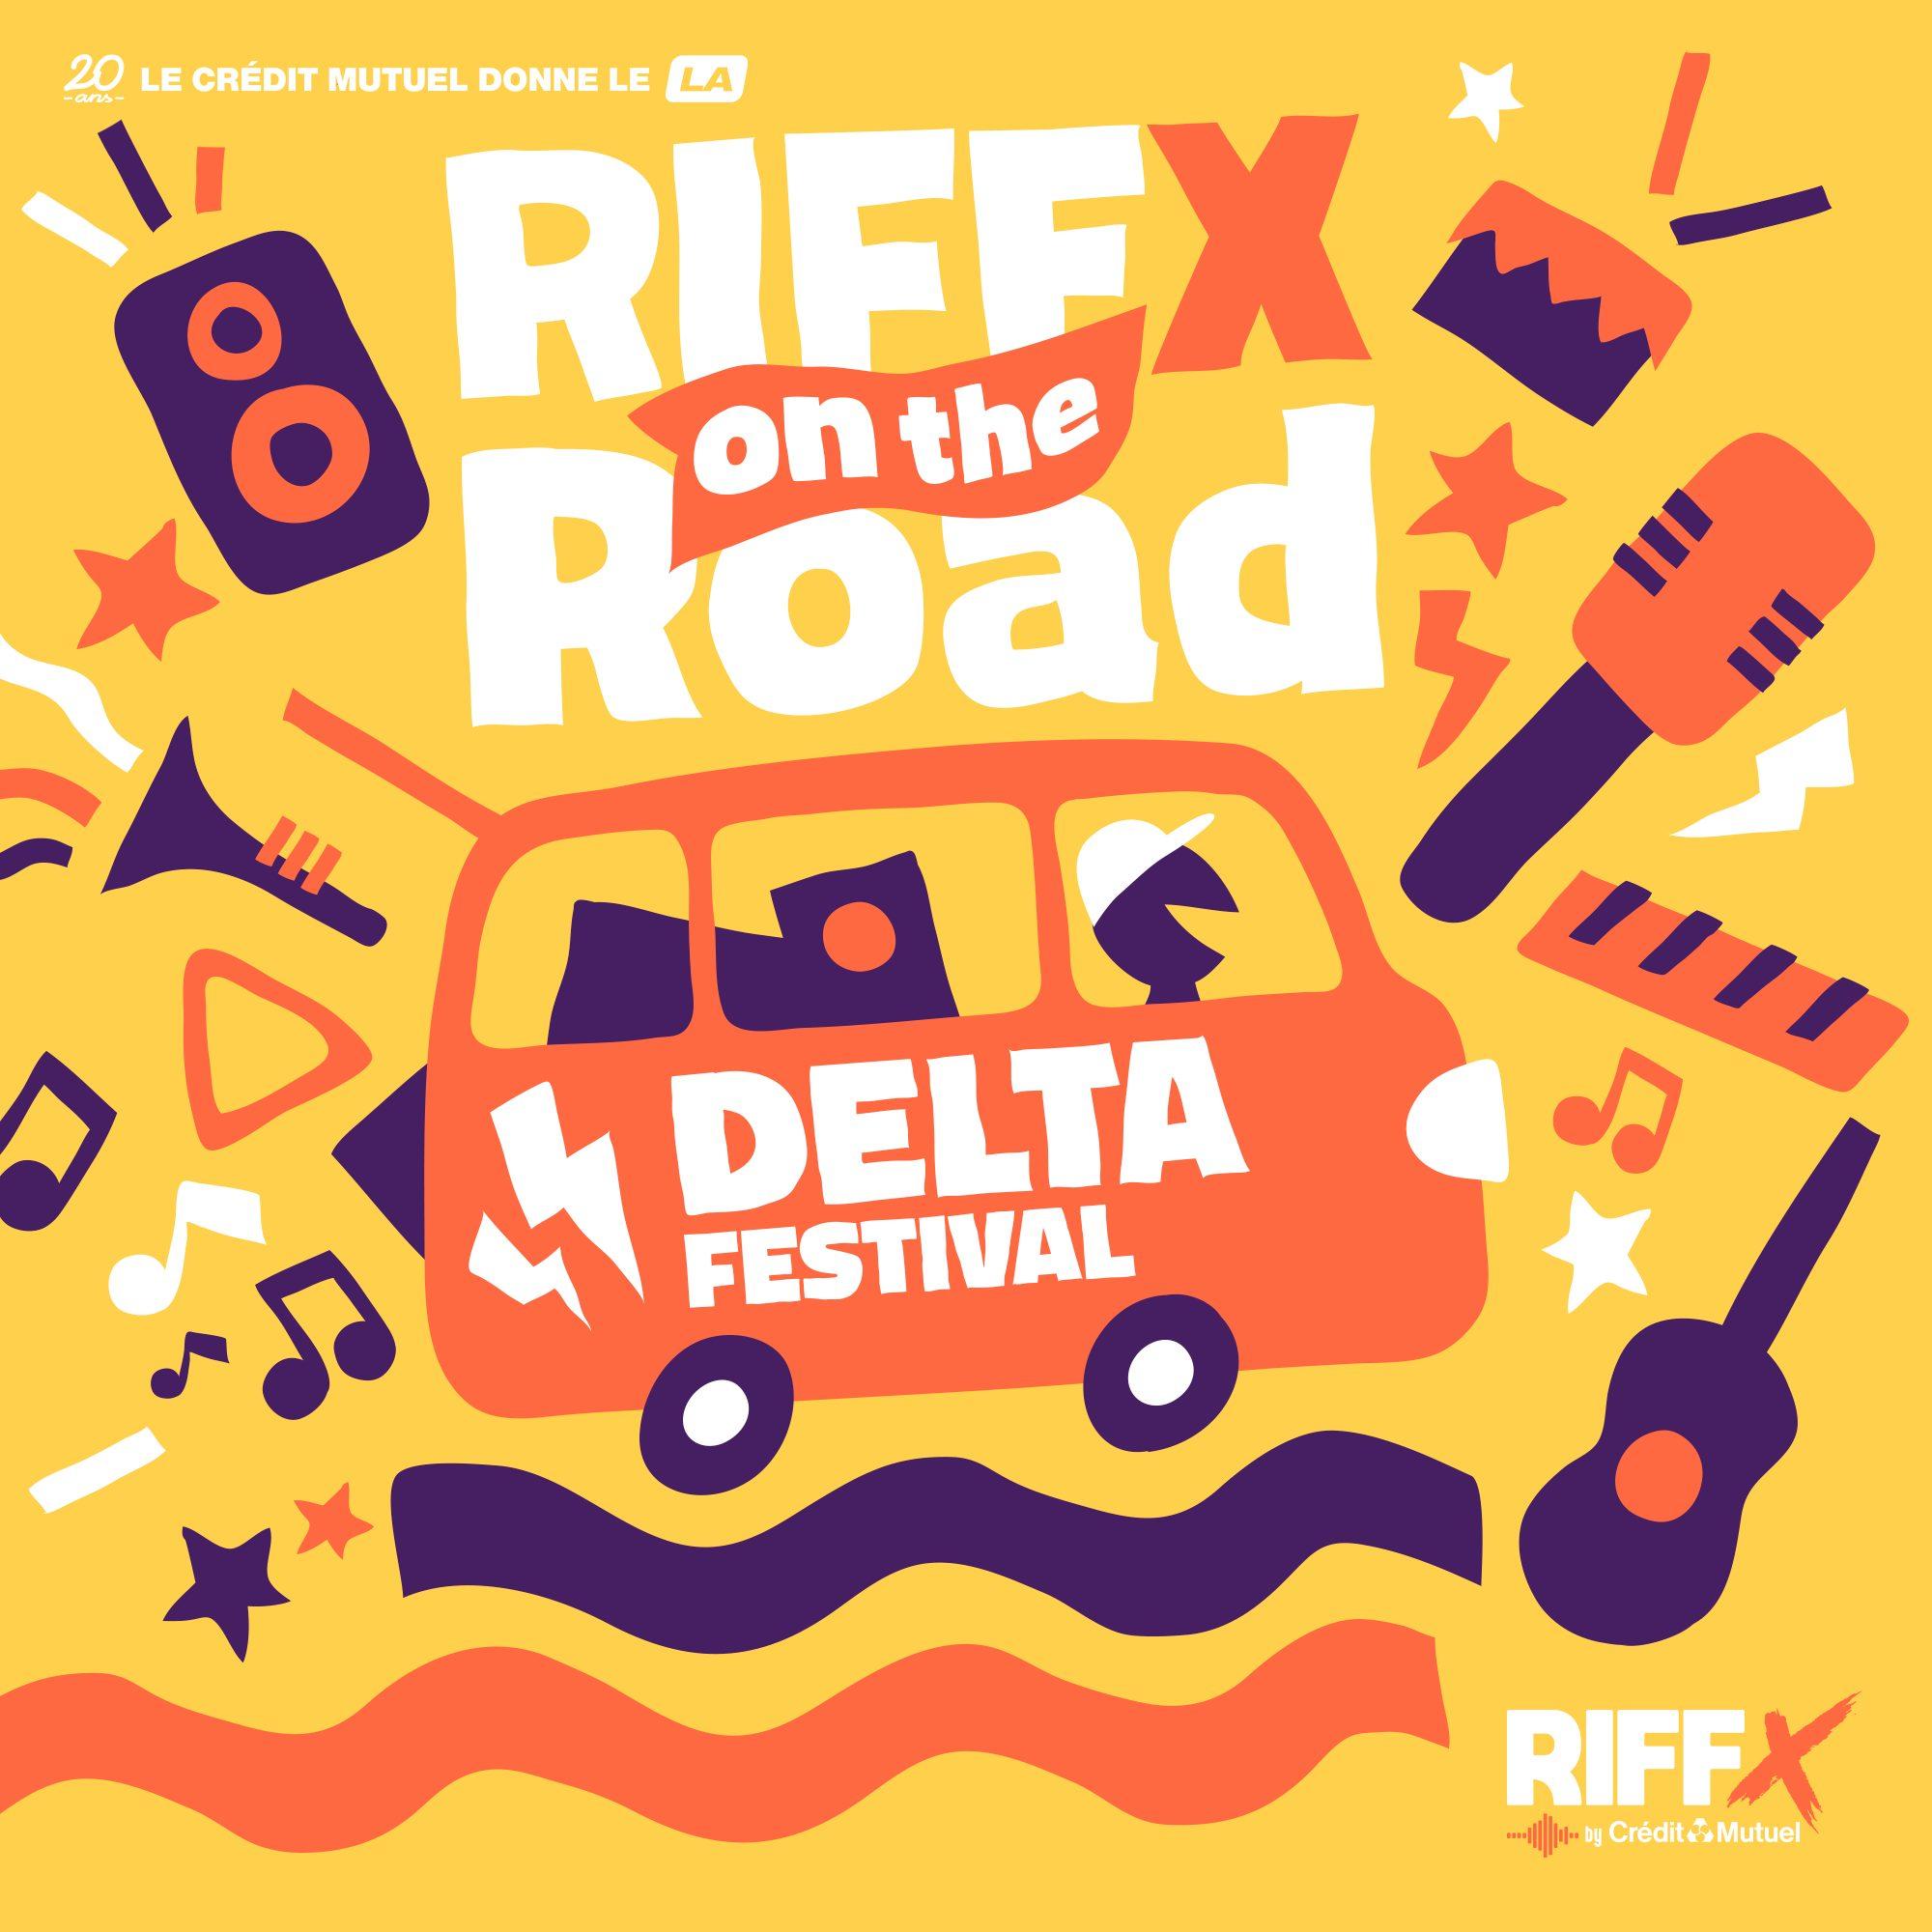 Lisa Meriot au micro de RIFFX – Podcast